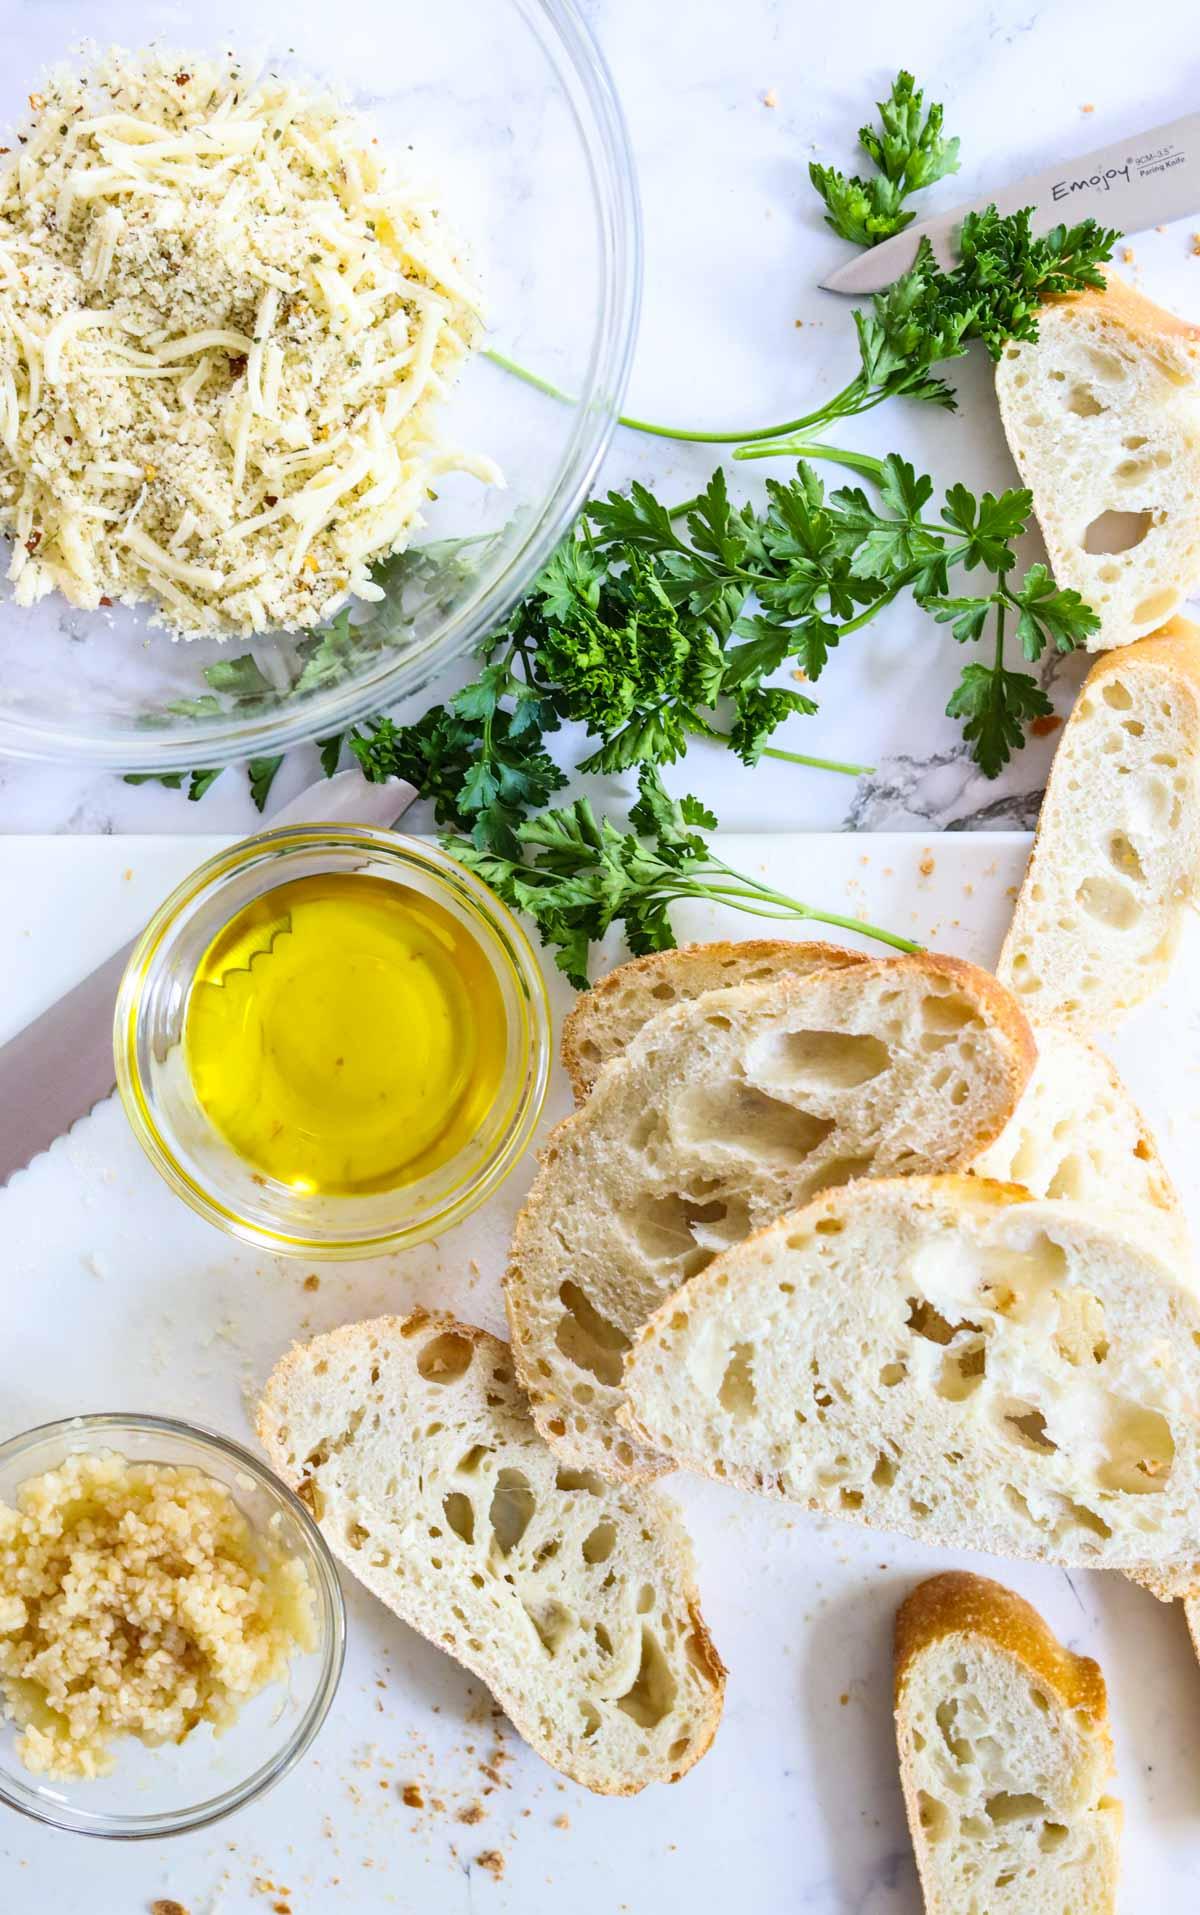 ingredients for garlic bread